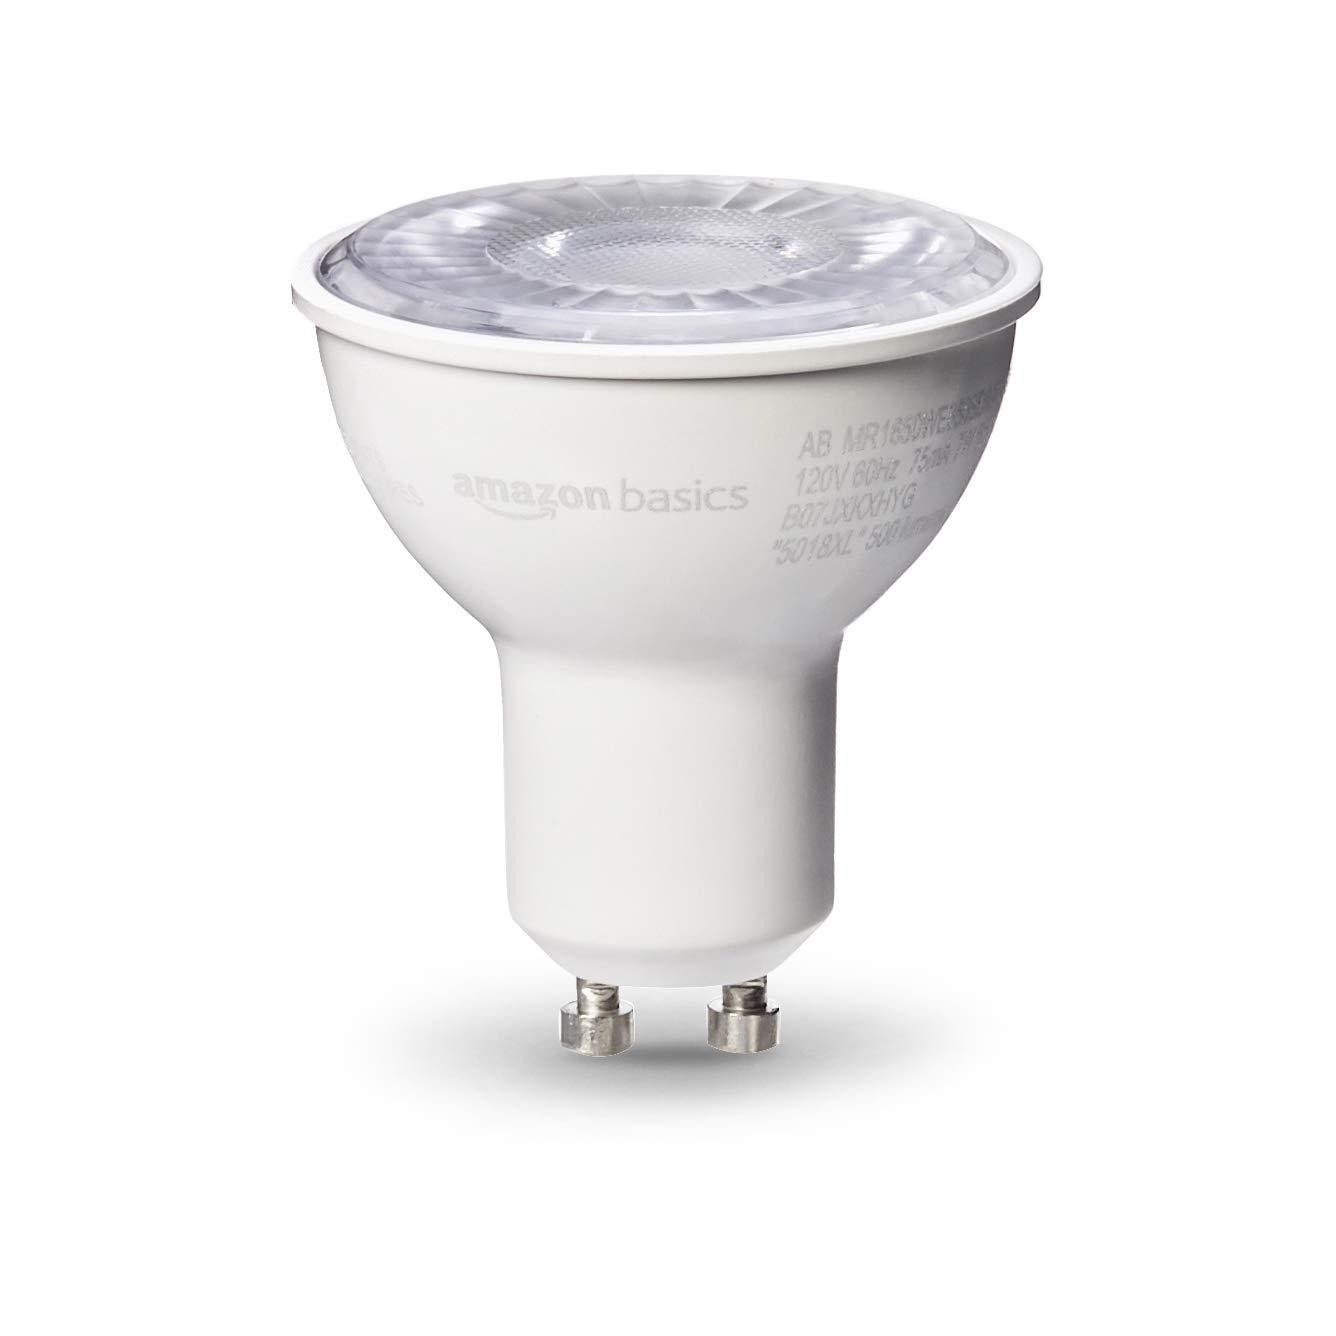 AmazonBasics 50W Equivalent, Daylight, Dimmable, 10,000 Hour Lifetime, MR16 (GU10 Base) LED Light Bulb   6-Pack